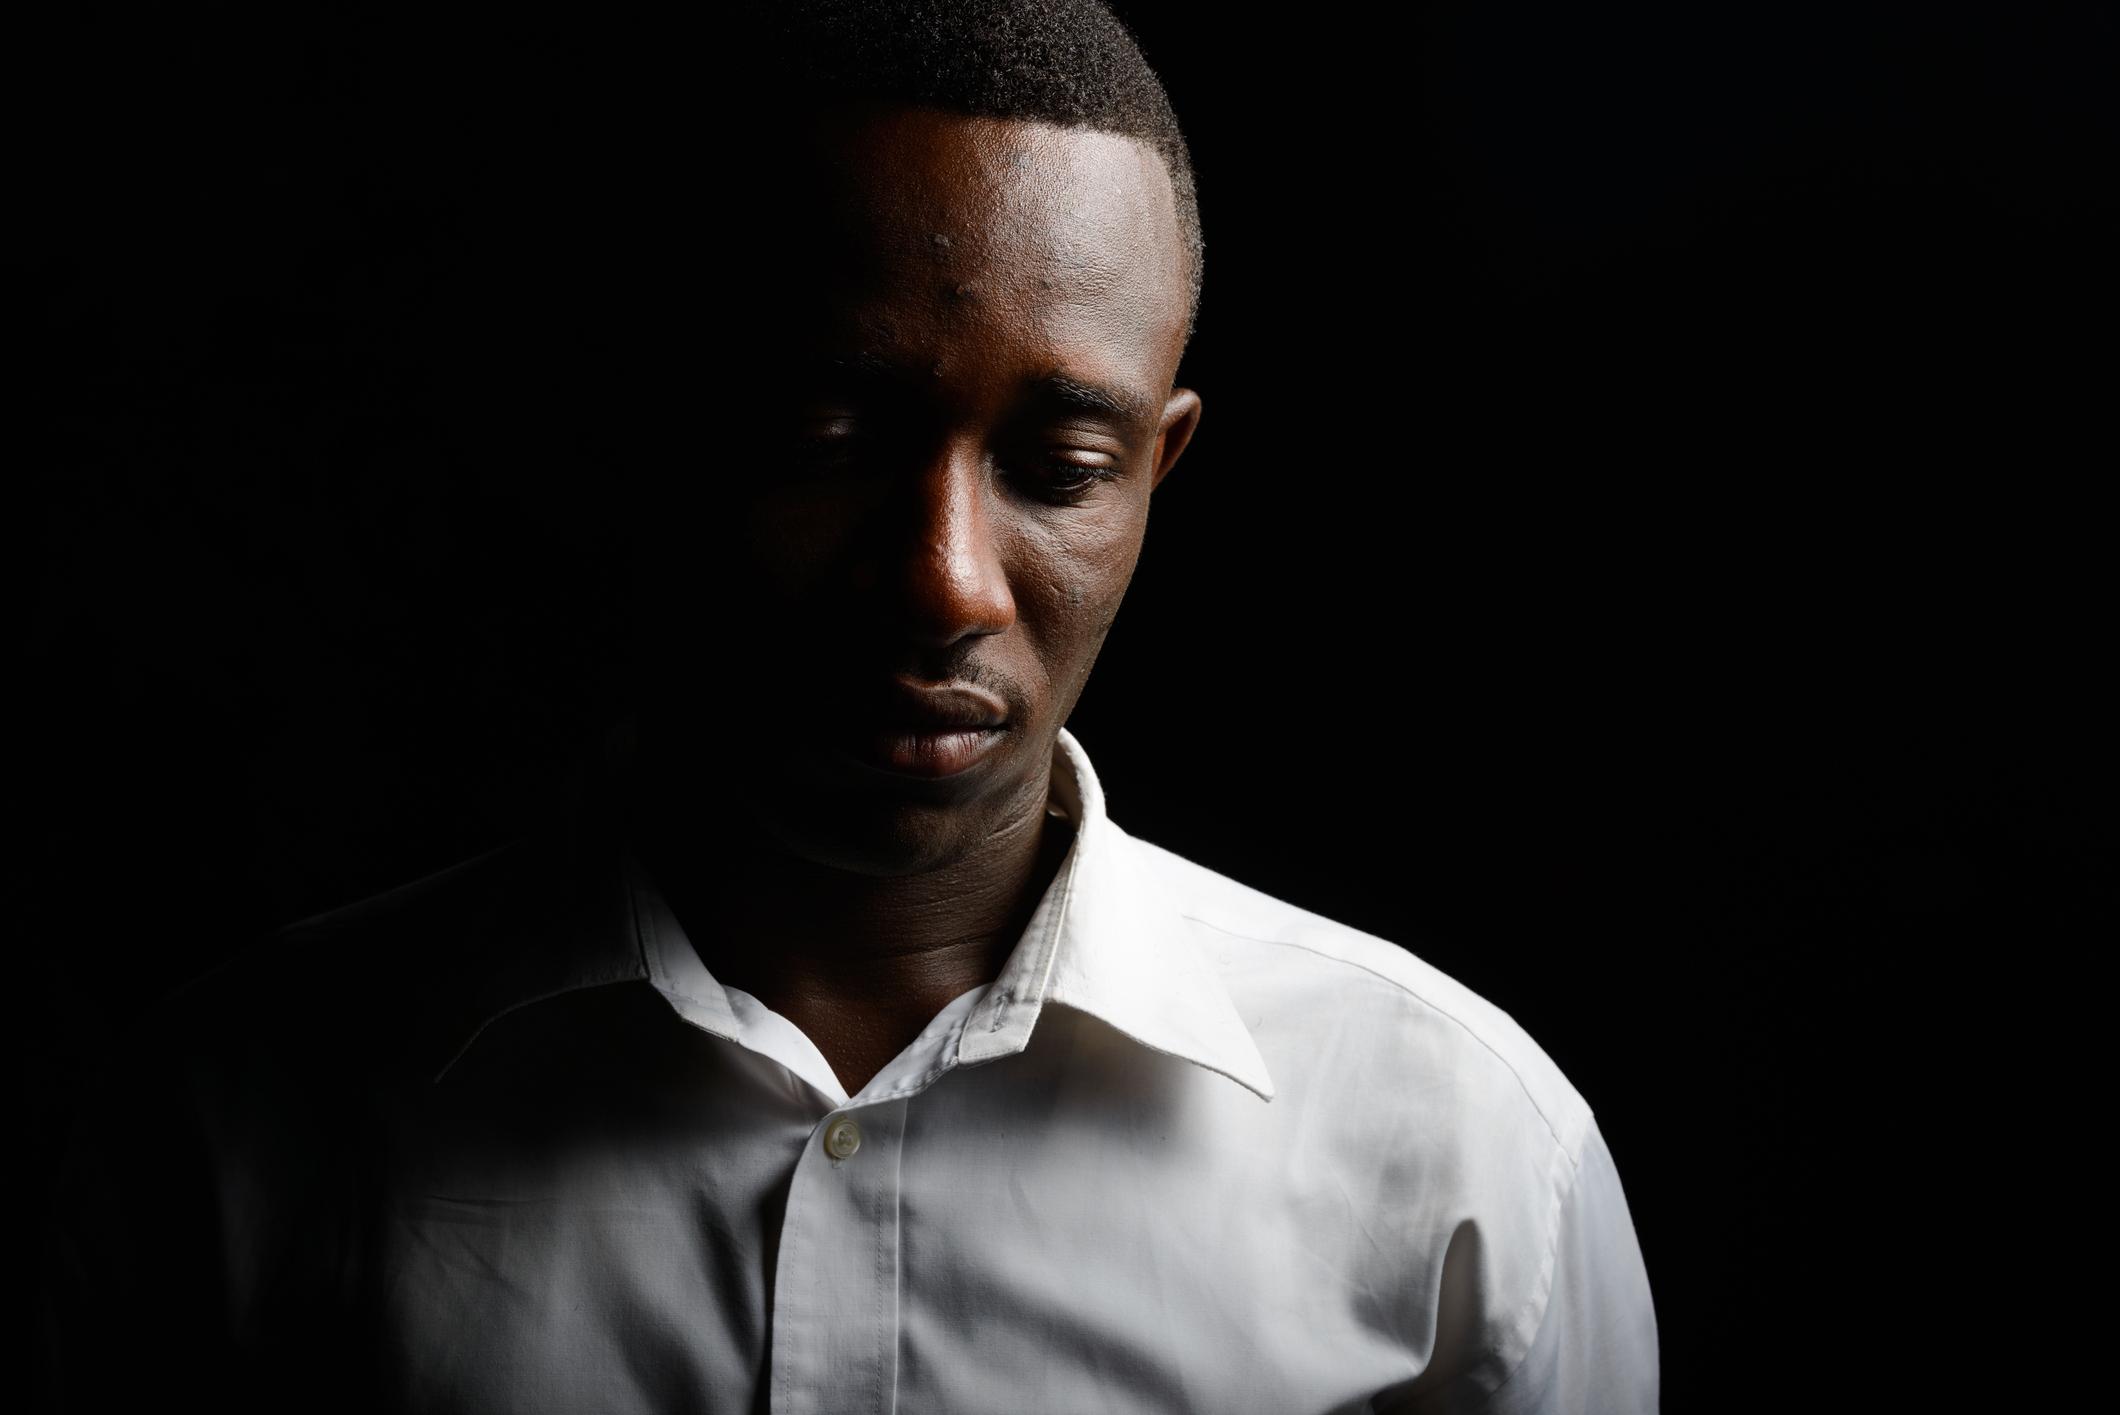 black man eyes down stock photo.jpg